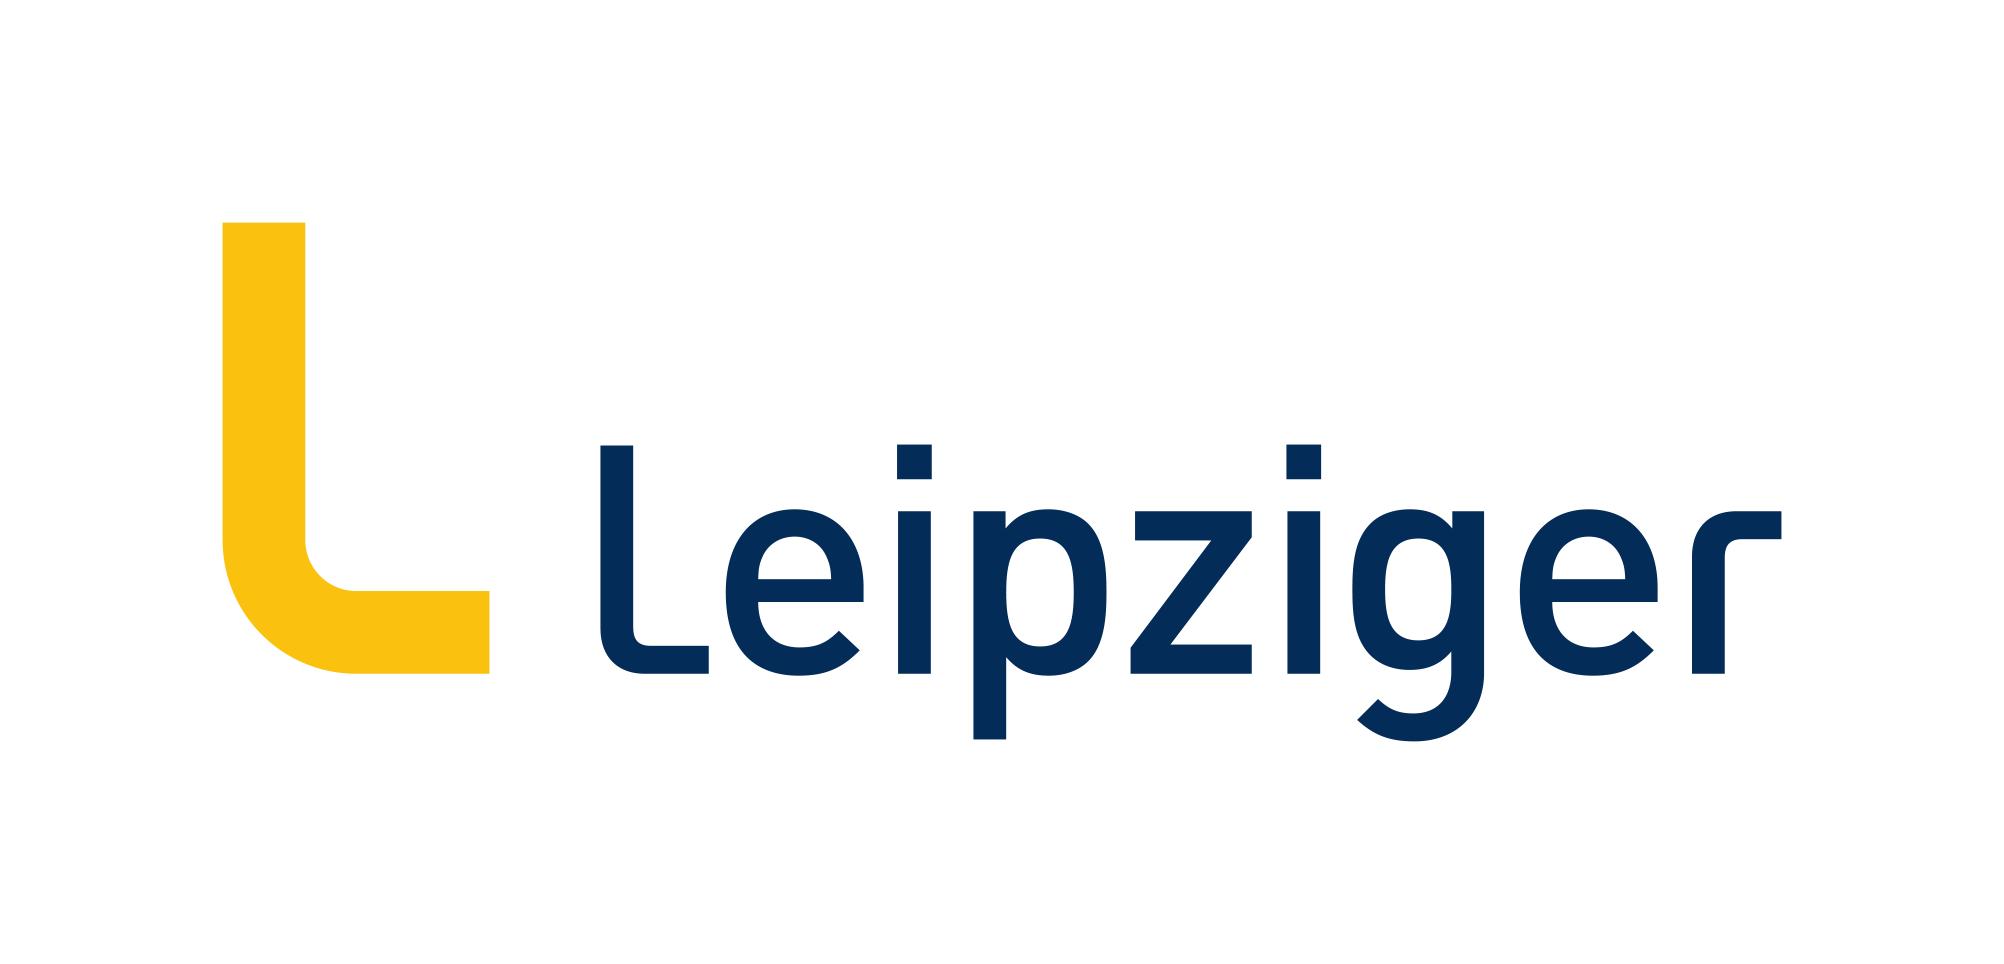 Leipziger